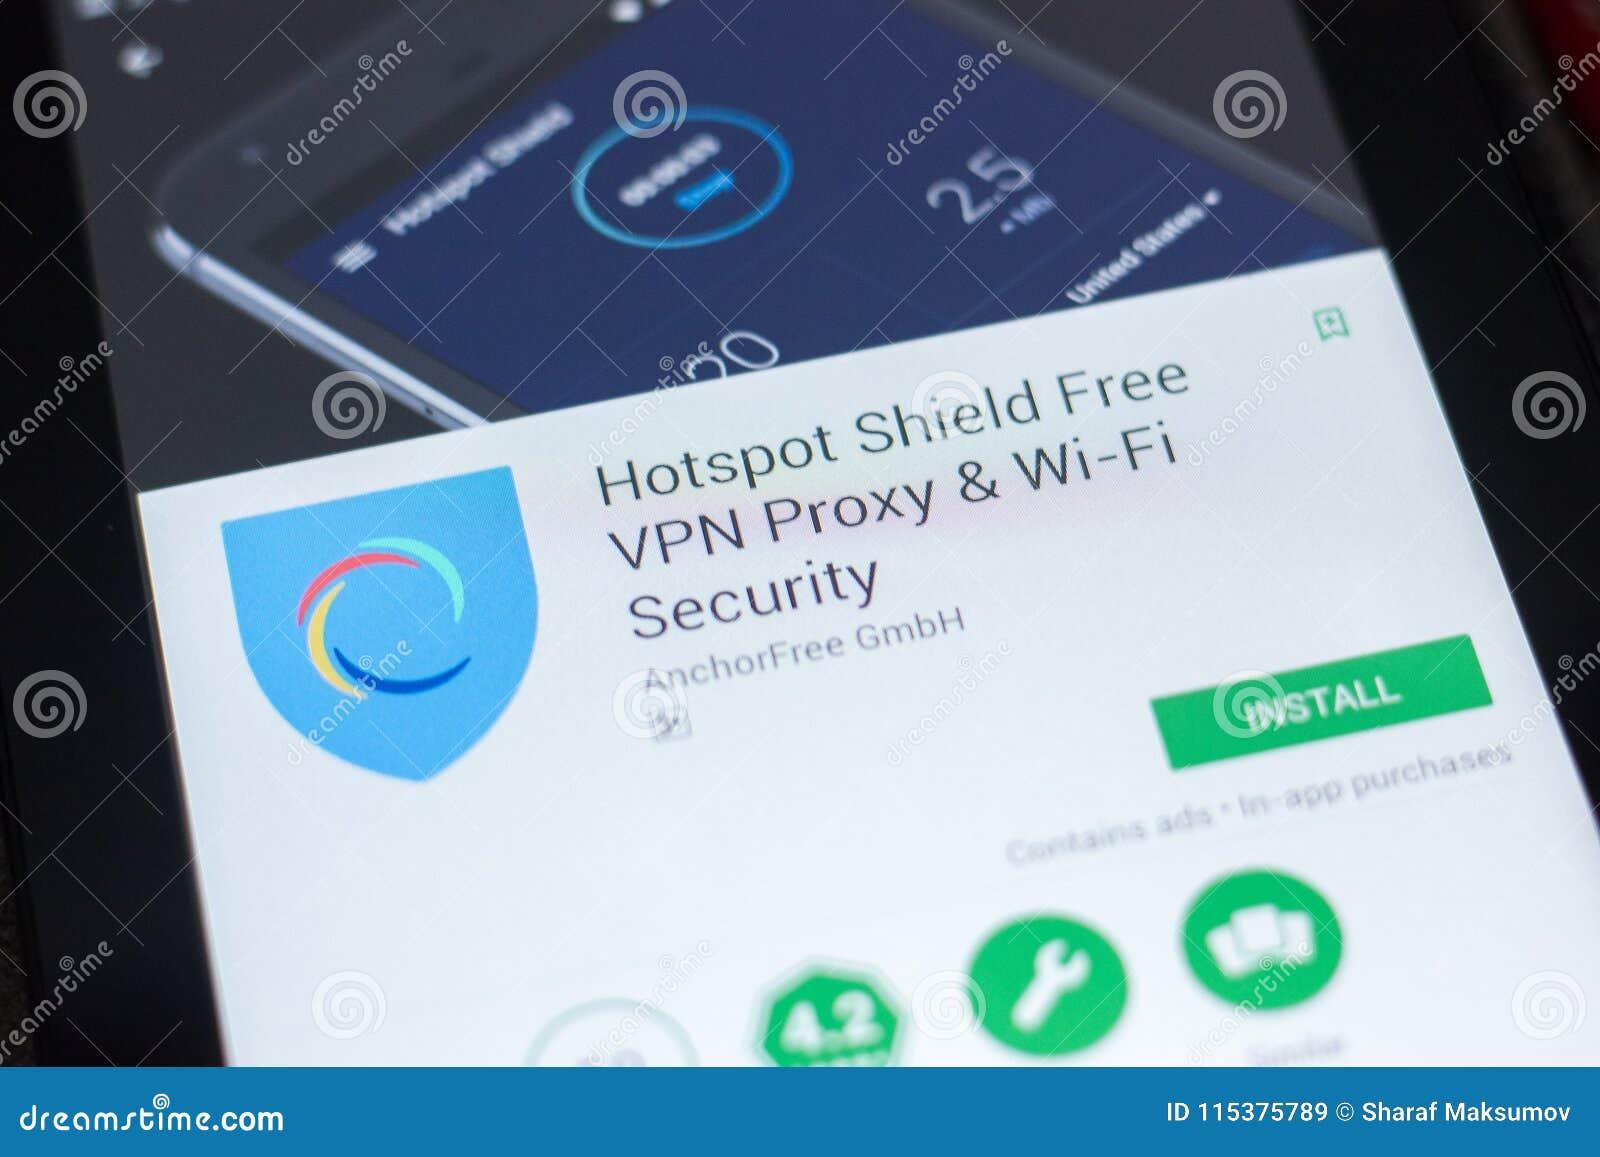 Ryazan, Russia - April 19, 2018 - Hotspot Shiels Free VPN